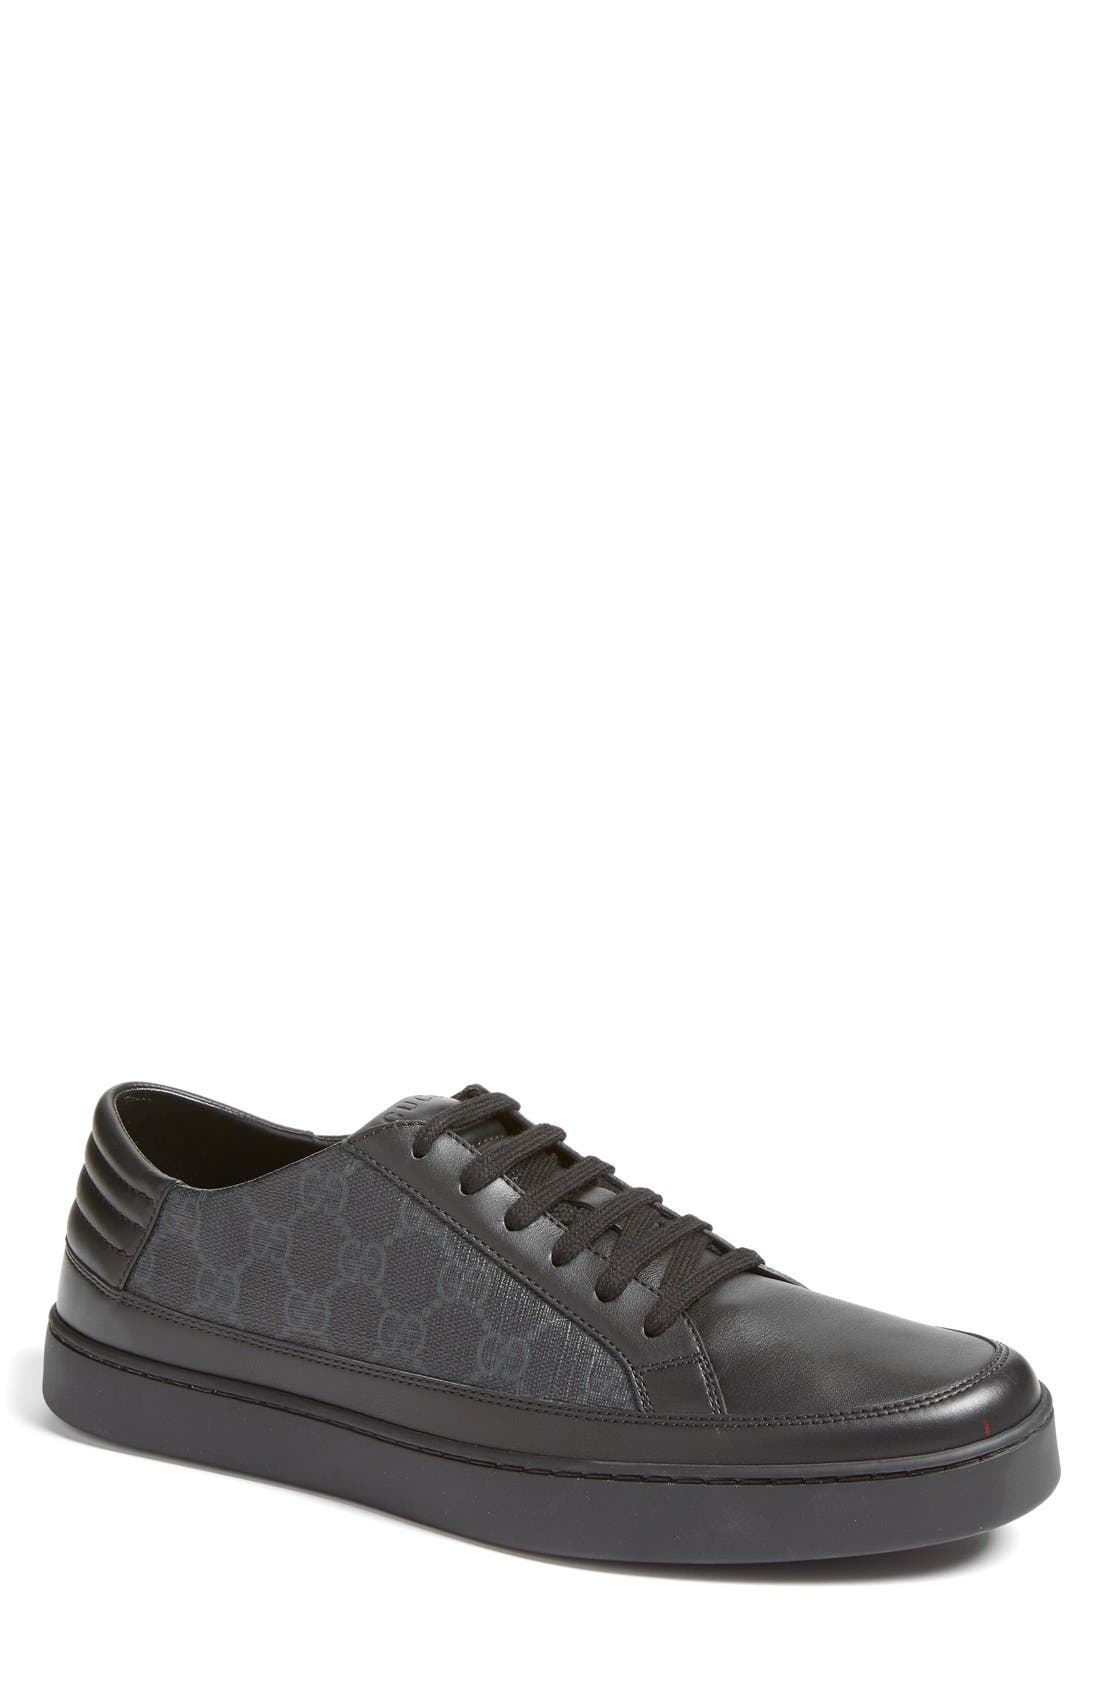 black gucci shoes for men high tops. main image - gucci \u0027common\u0027 low-top sneaker (men) black shoes for men high tops h